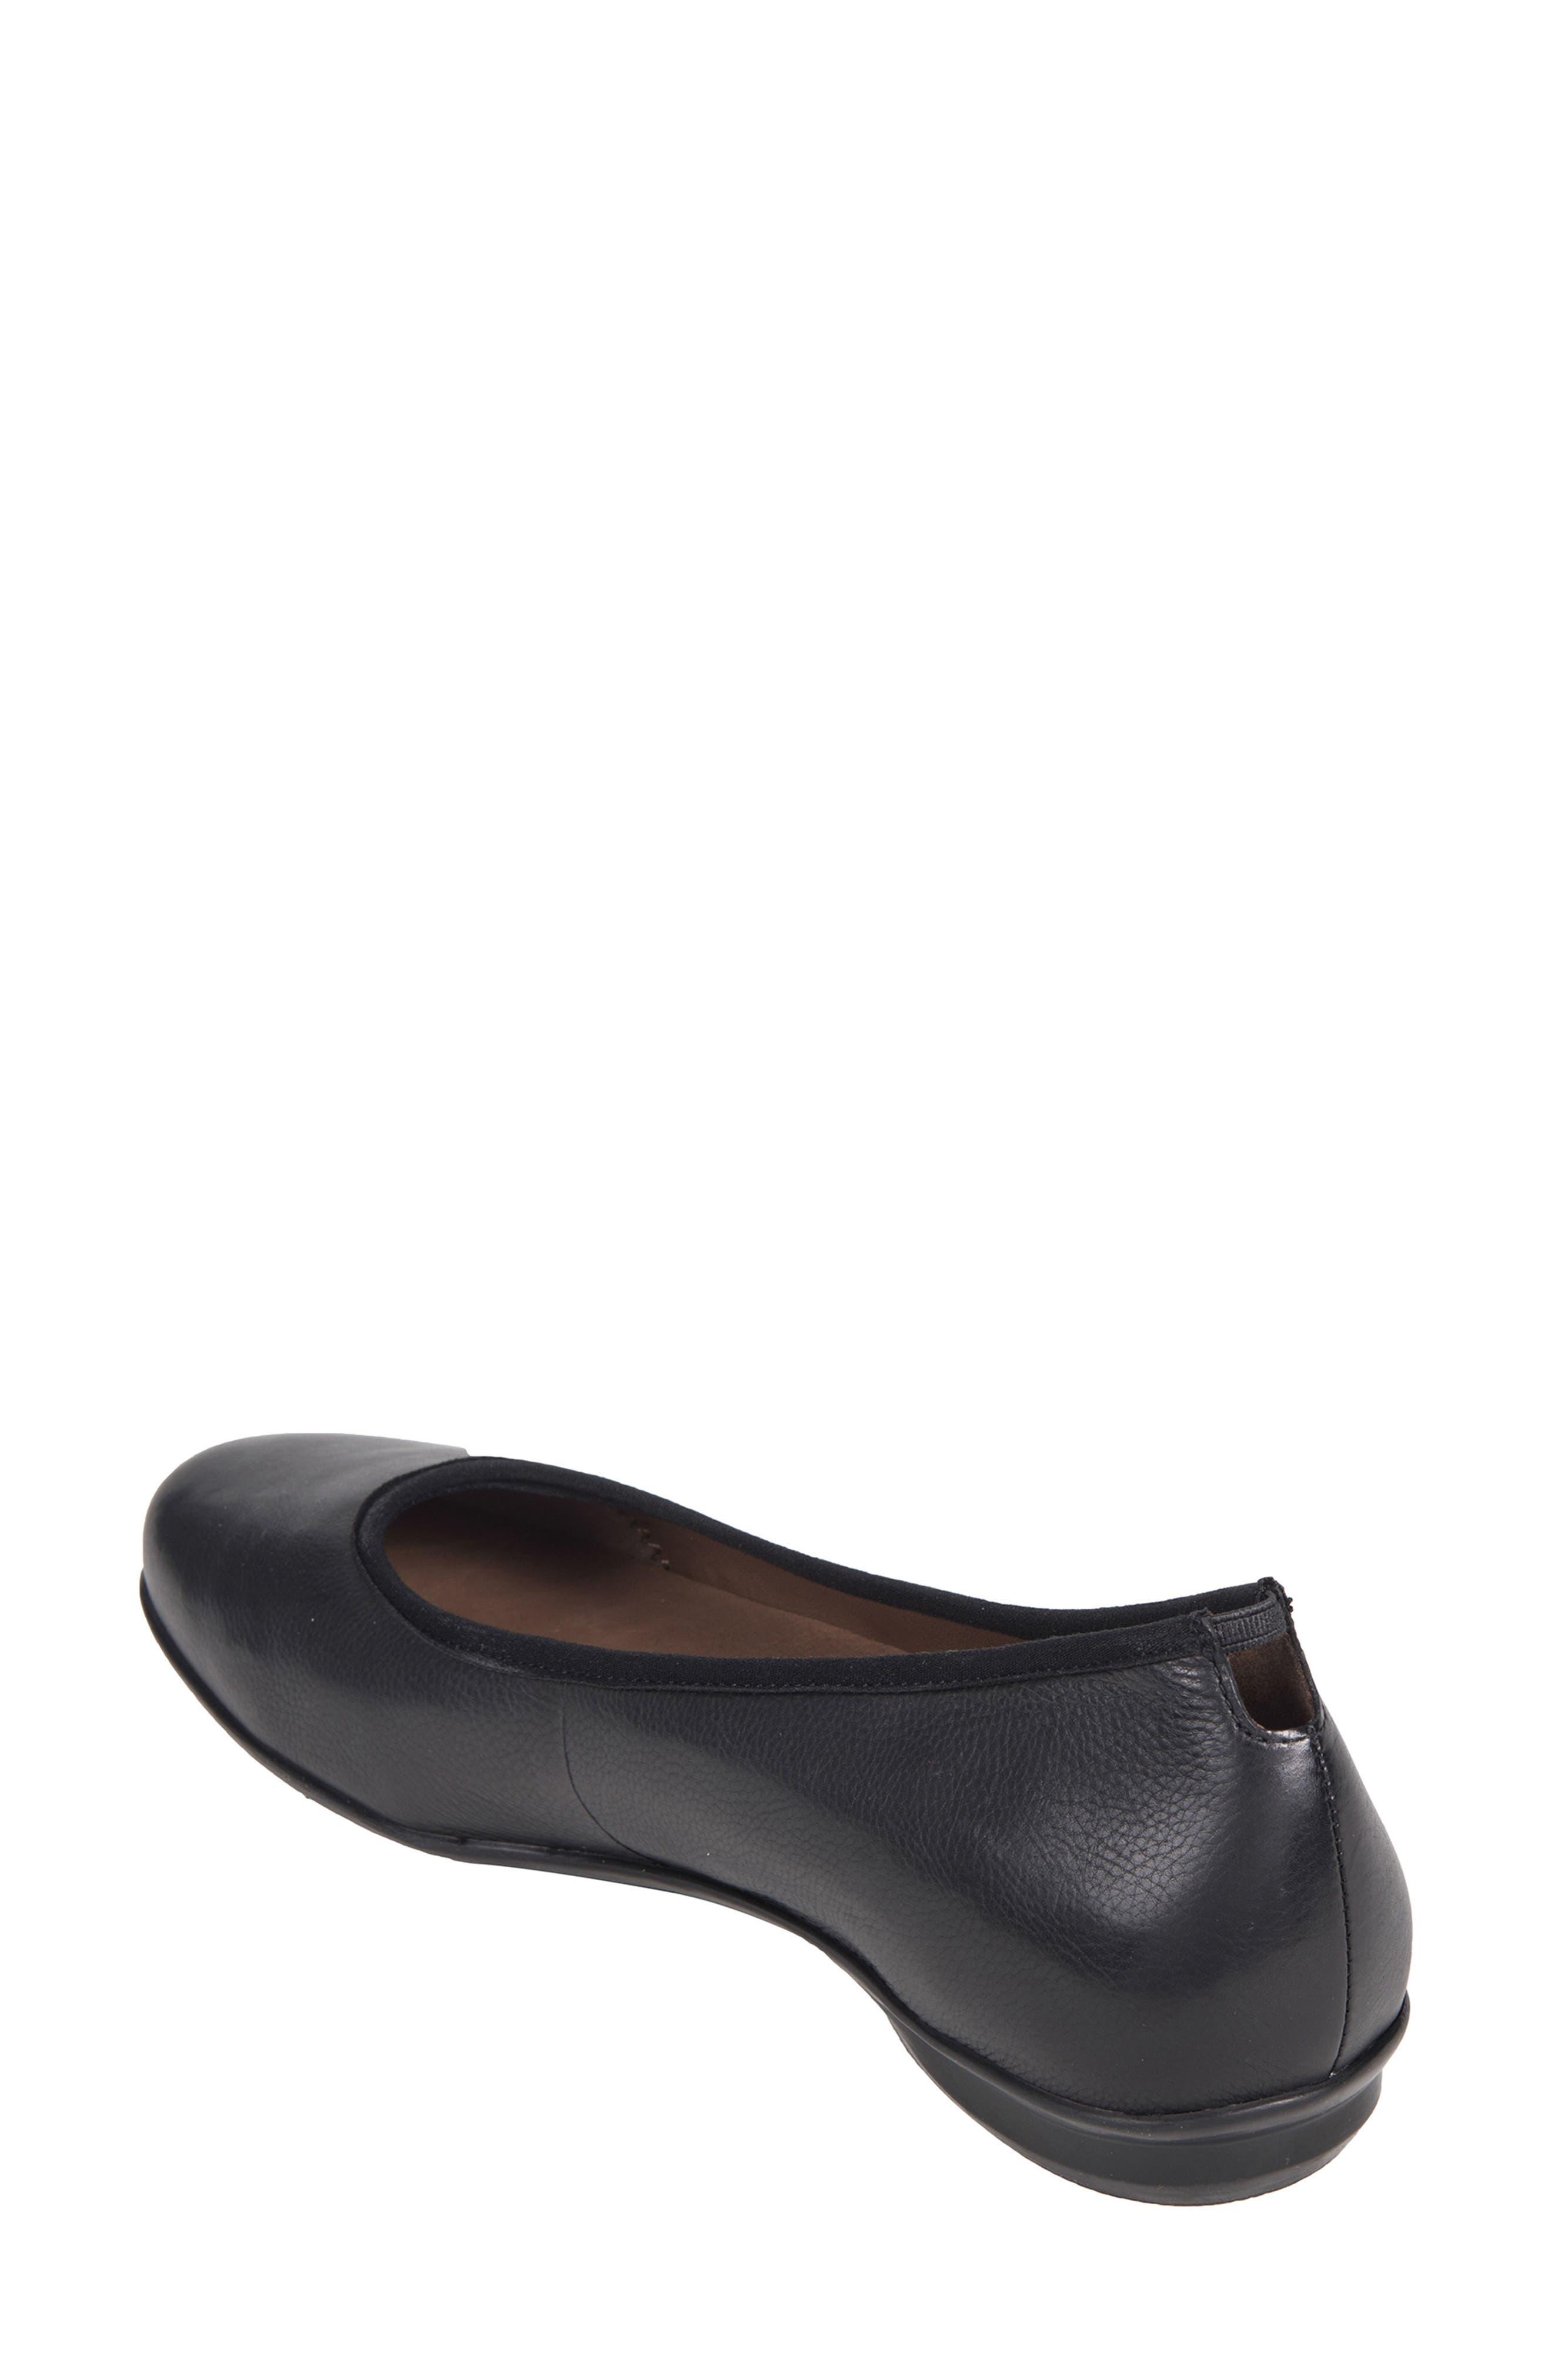 Ennis Flat,                             Alternate thumbnail 2, color,                             Black Leather